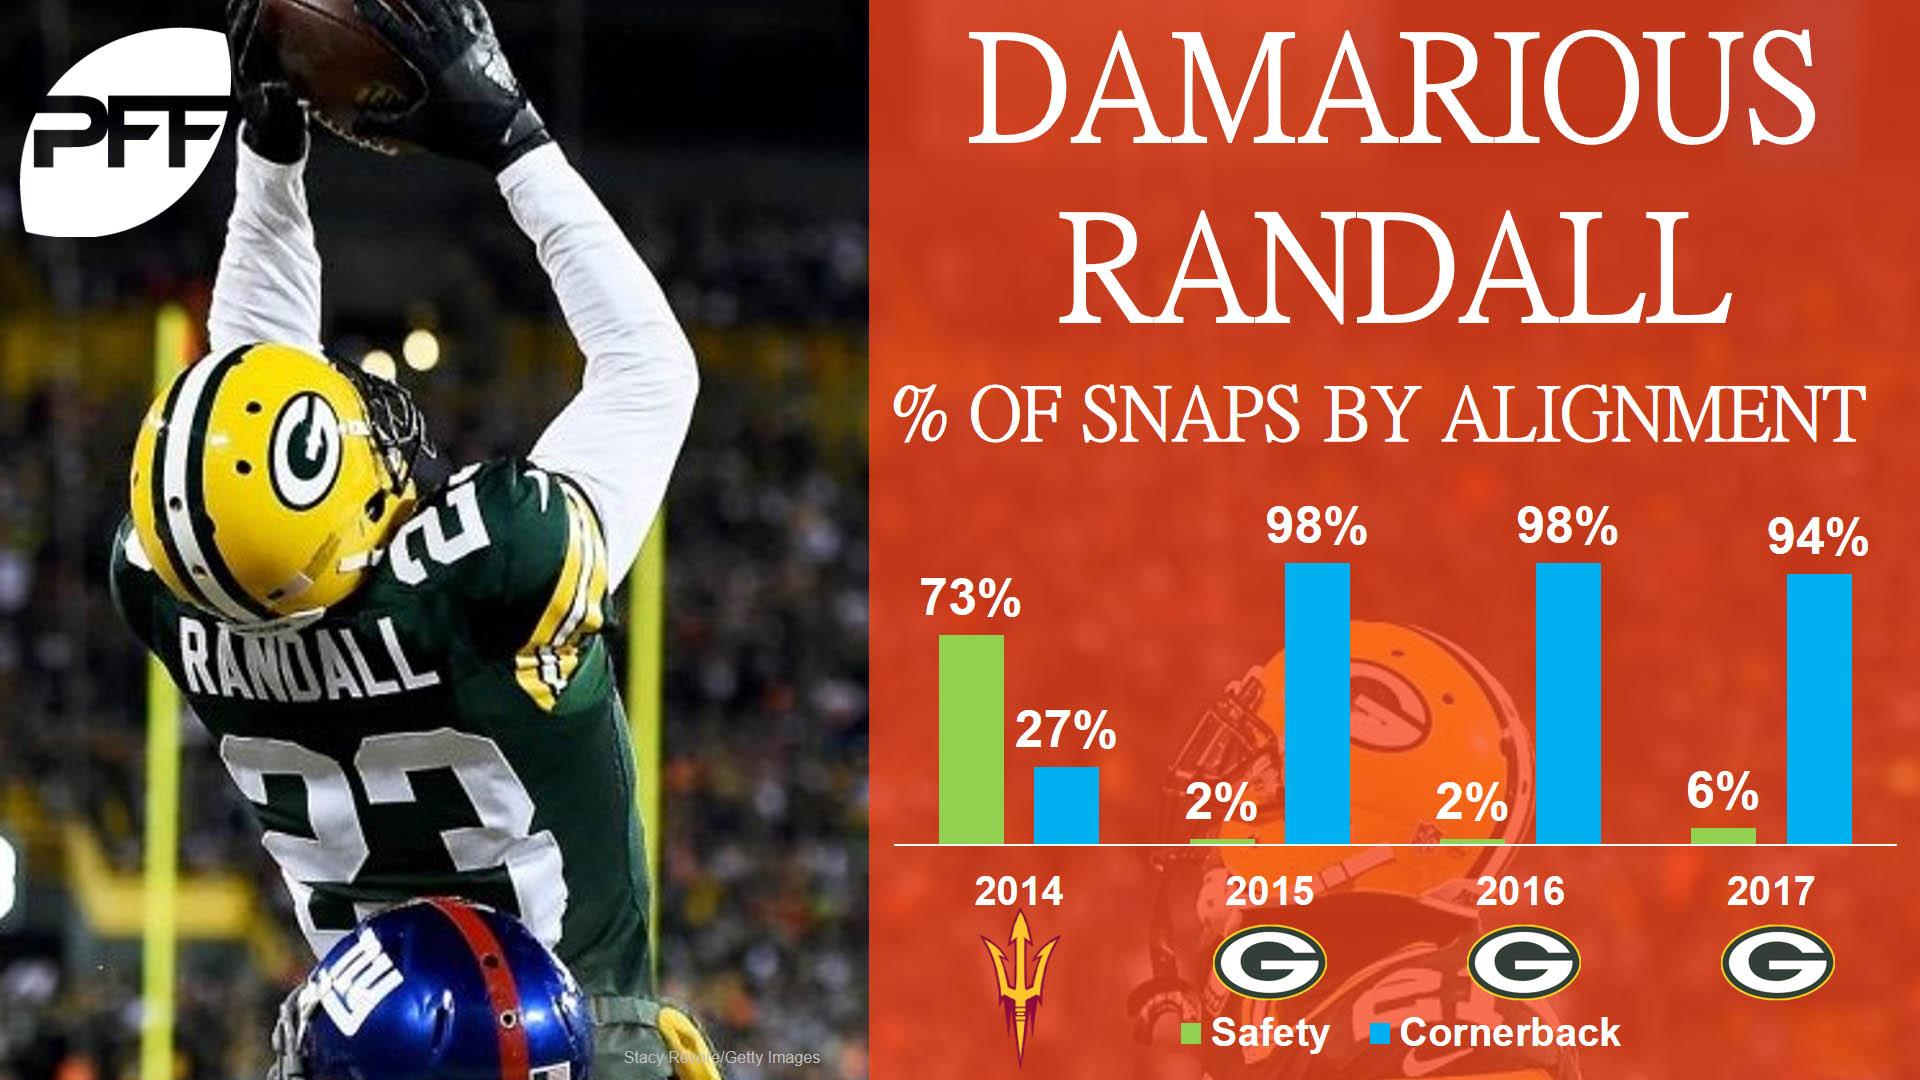 Damarious Randall